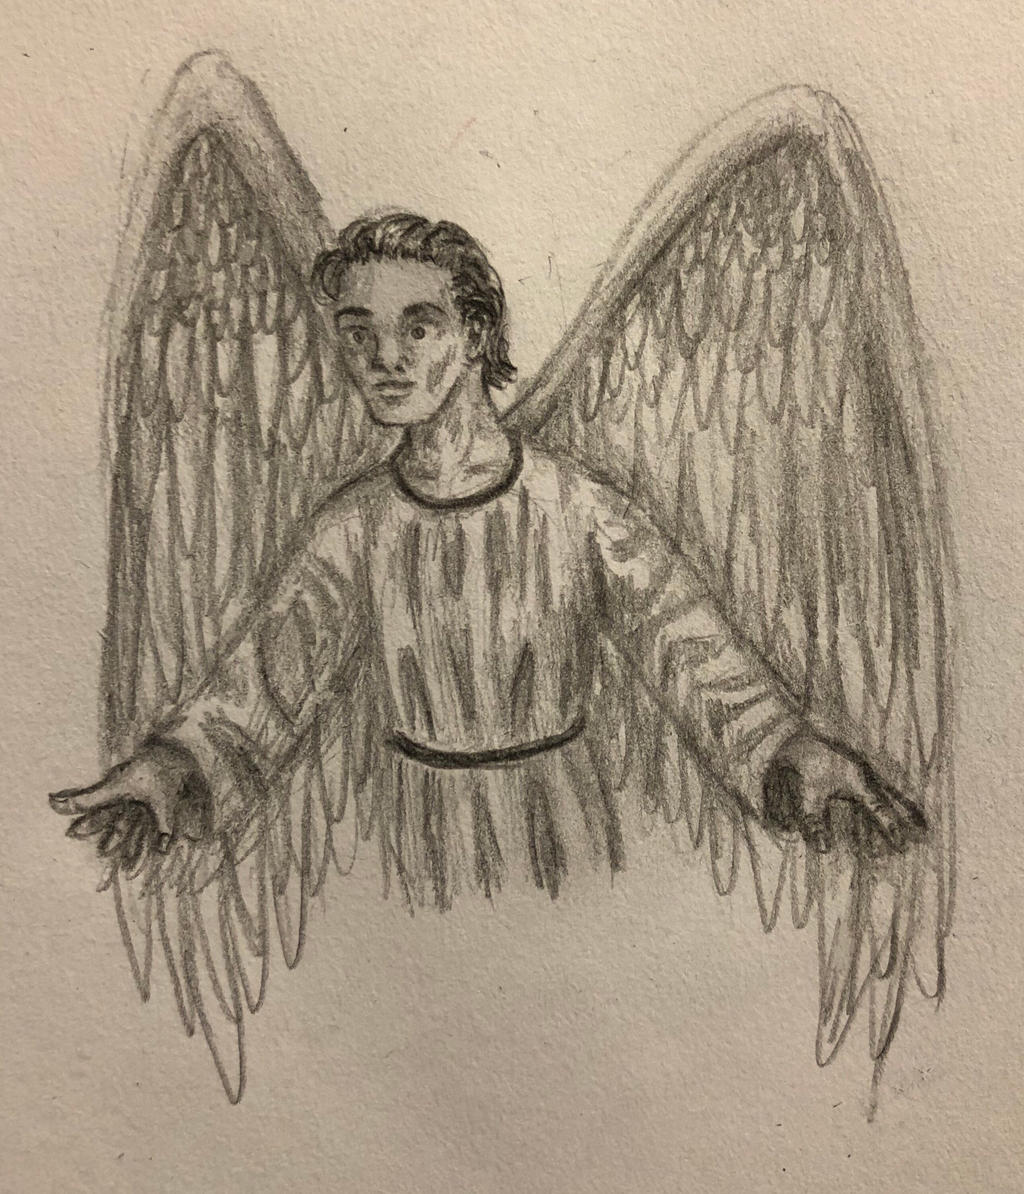 Angel by swiftcross